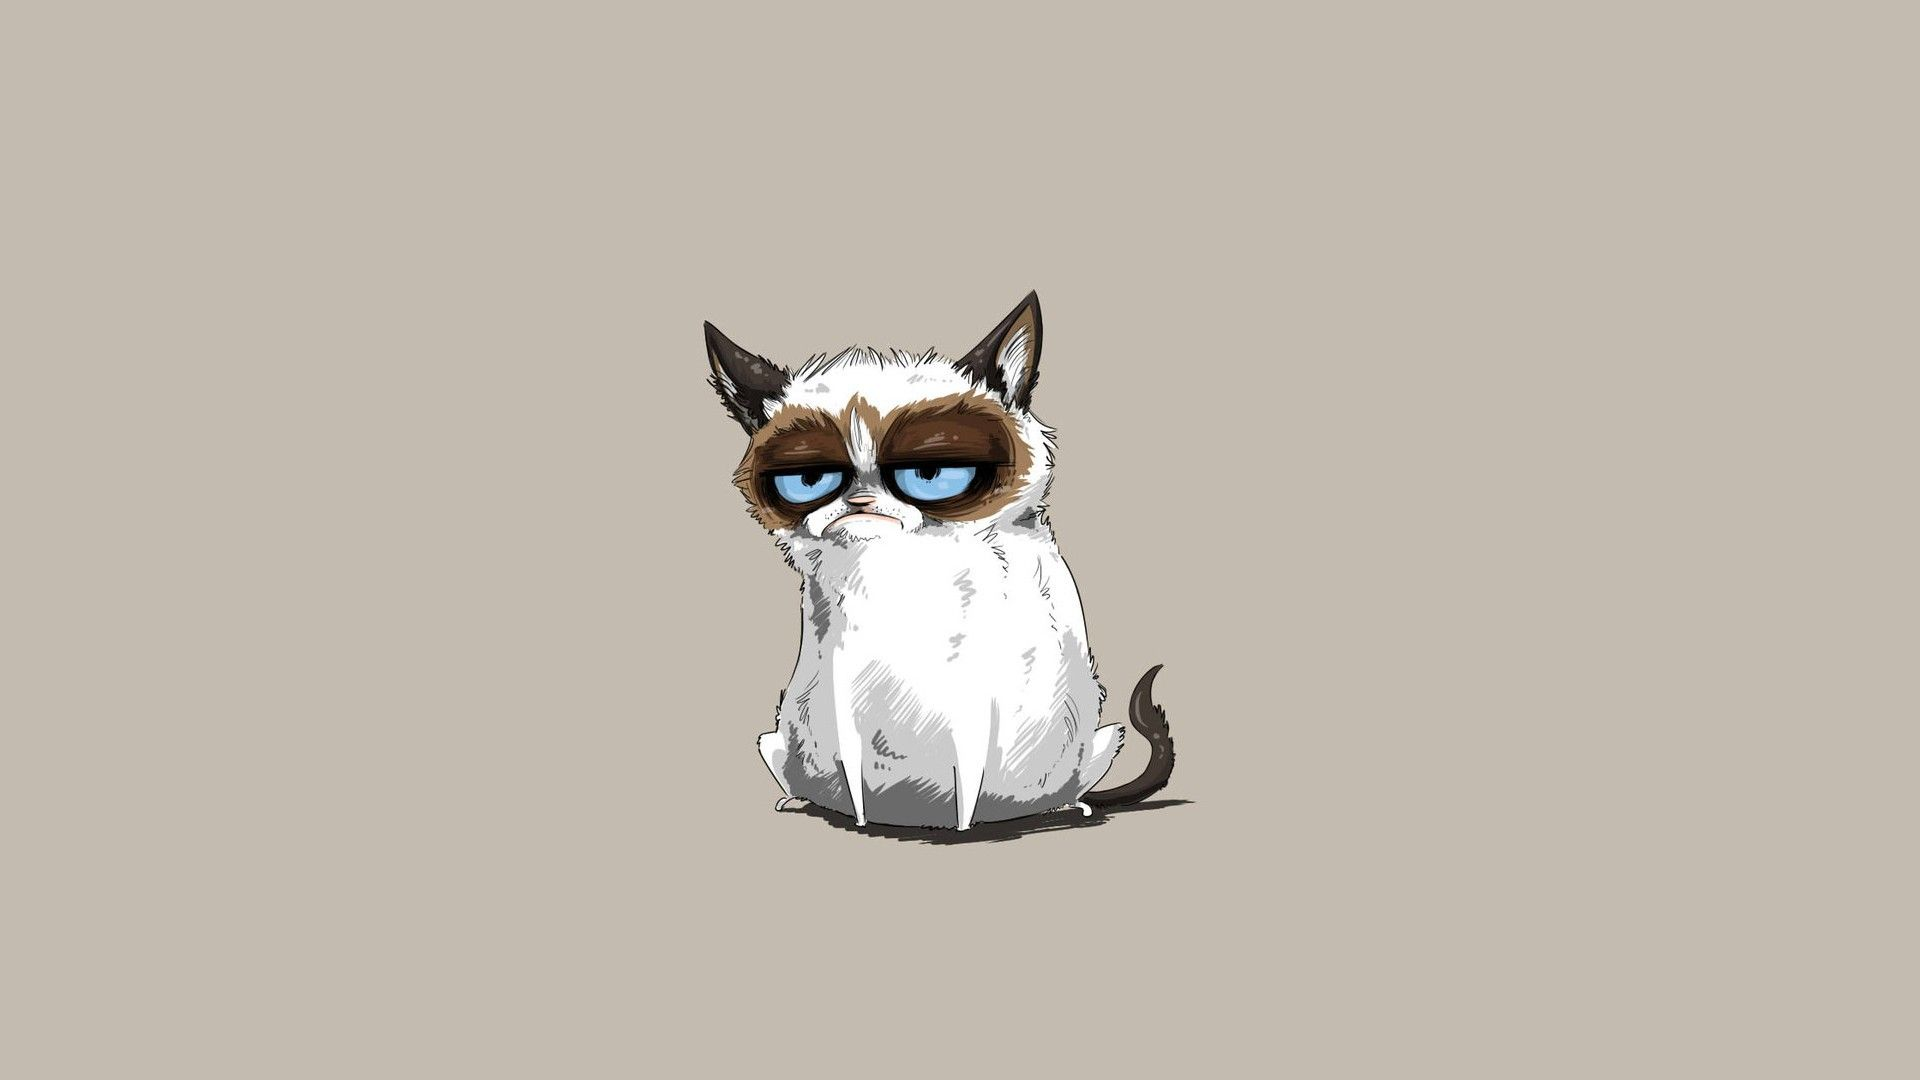 51 Best Free Cartoon Cat Desktop Wallpapers Wallpaperaccess